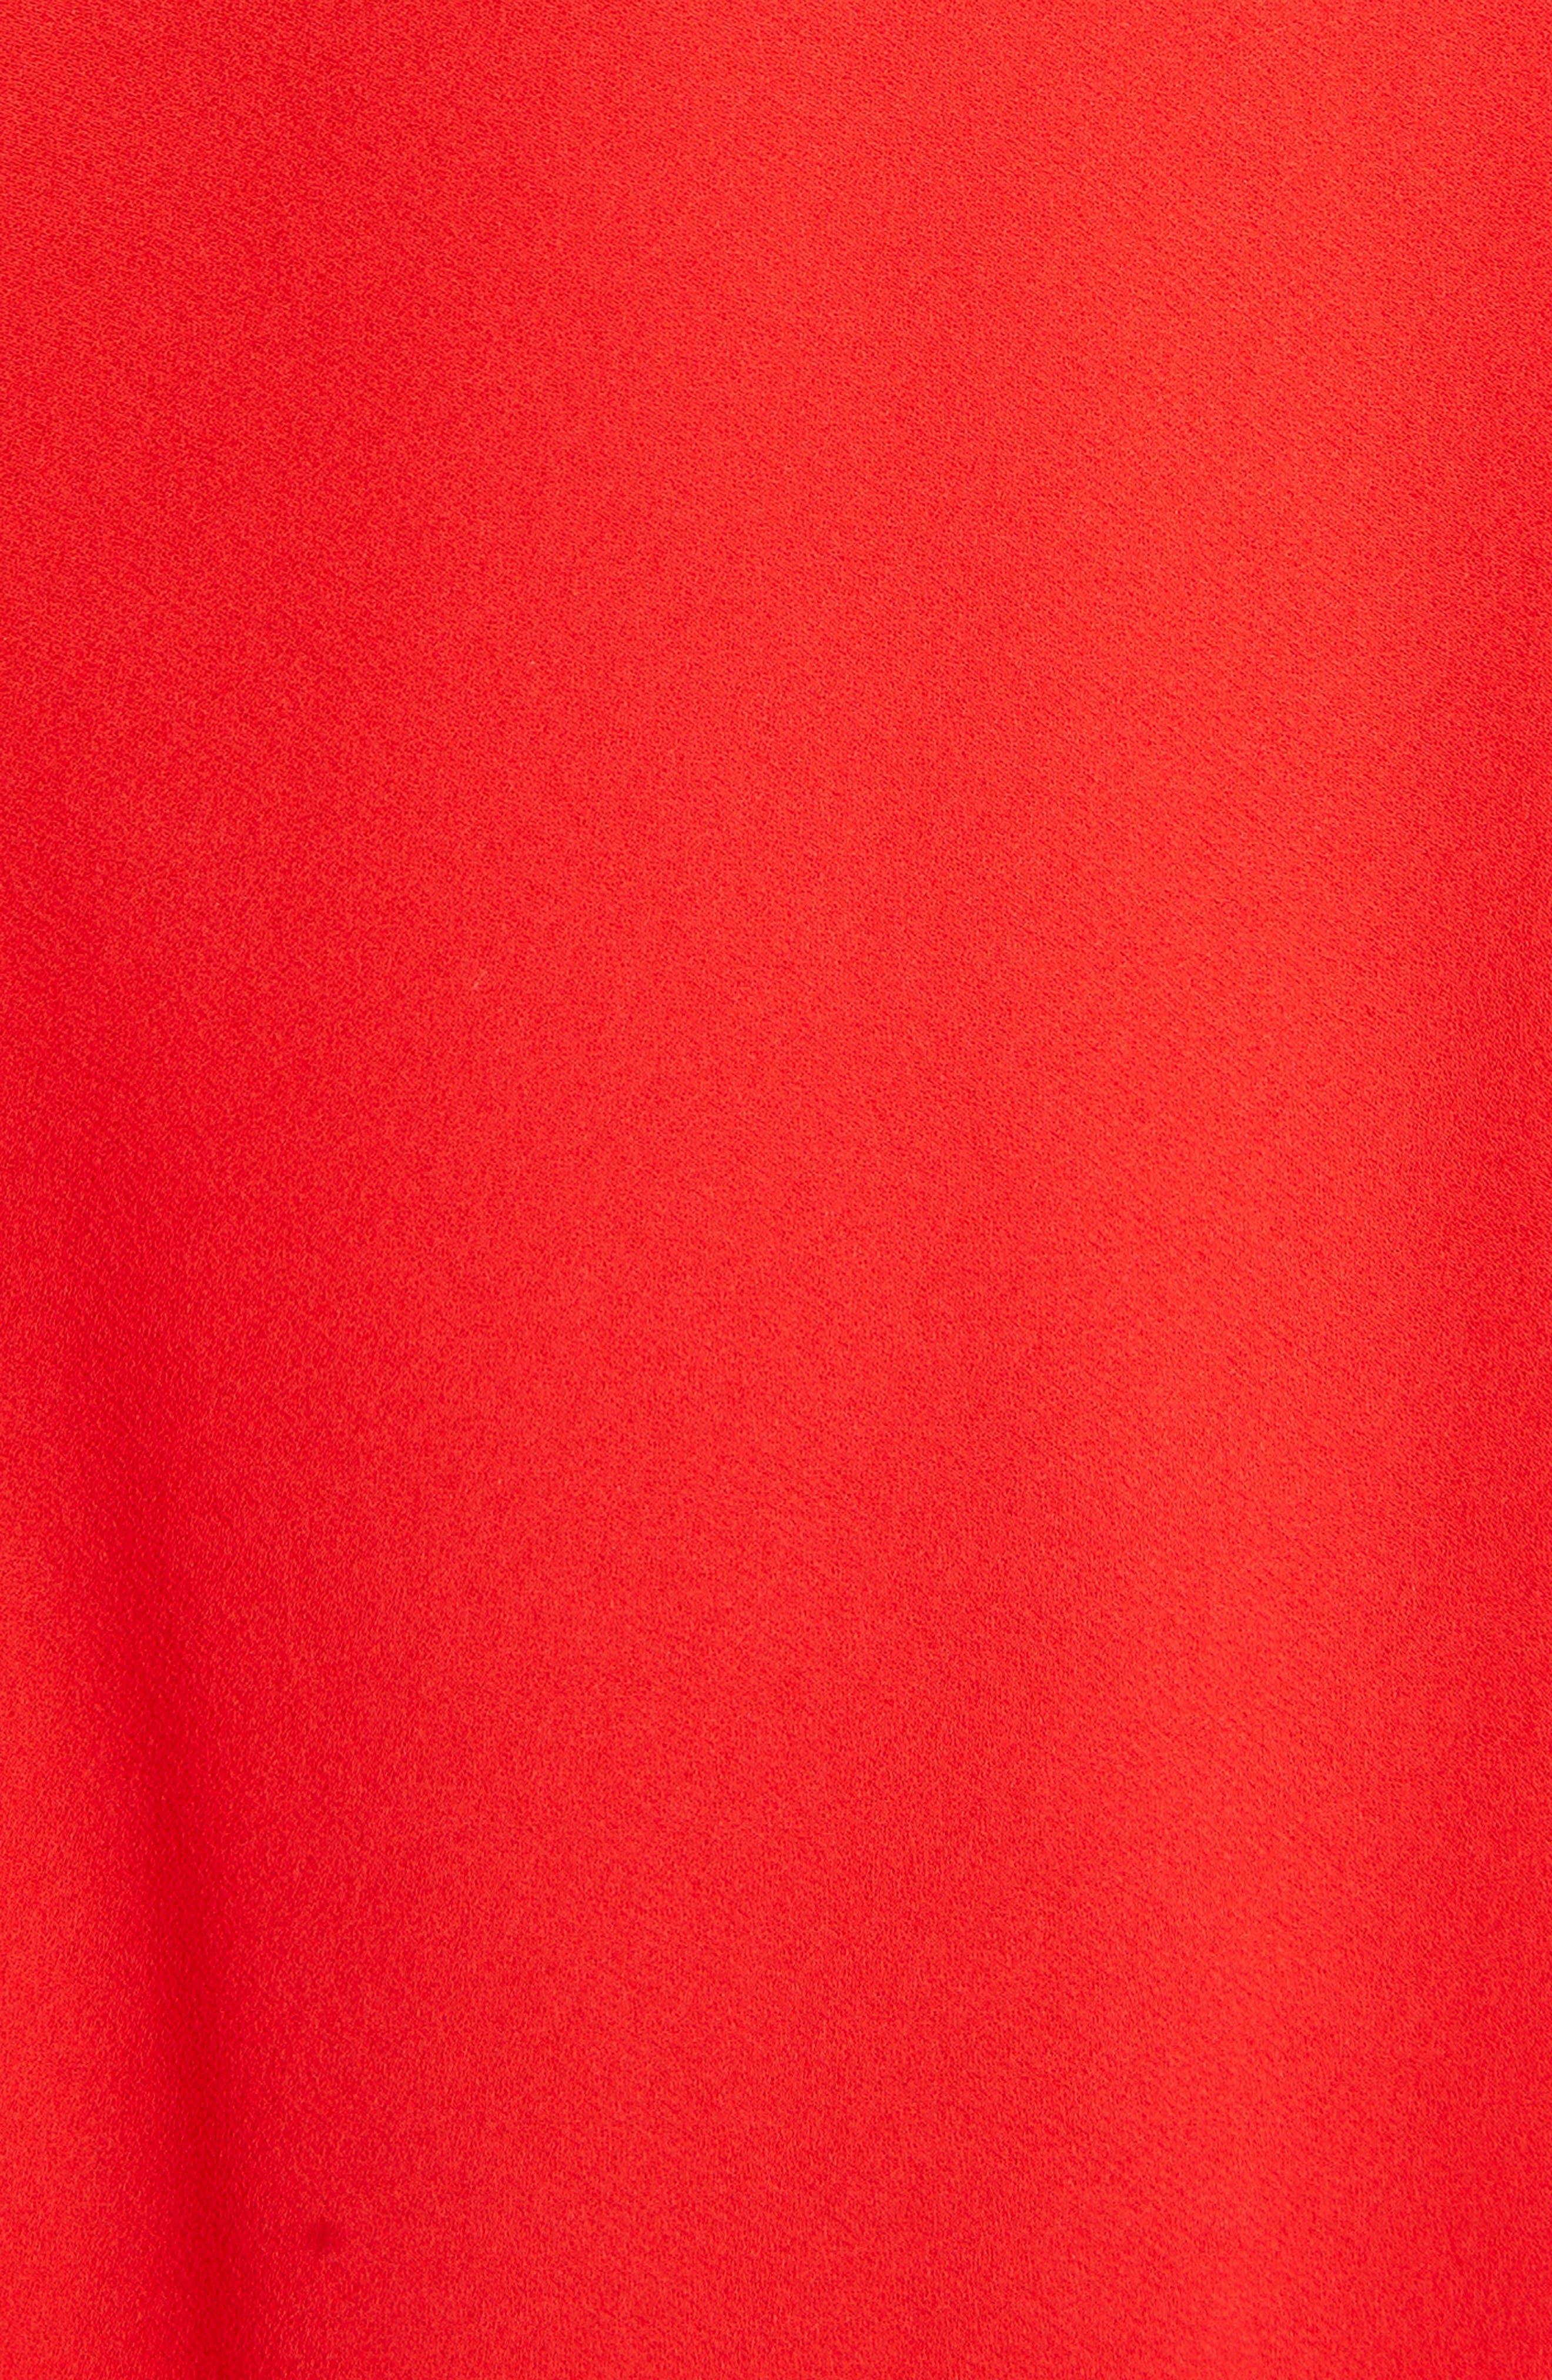 Asymmetrical Ruffle Trim Silk Georgette Top,                             Alternate thumbnail 4, color,                             646